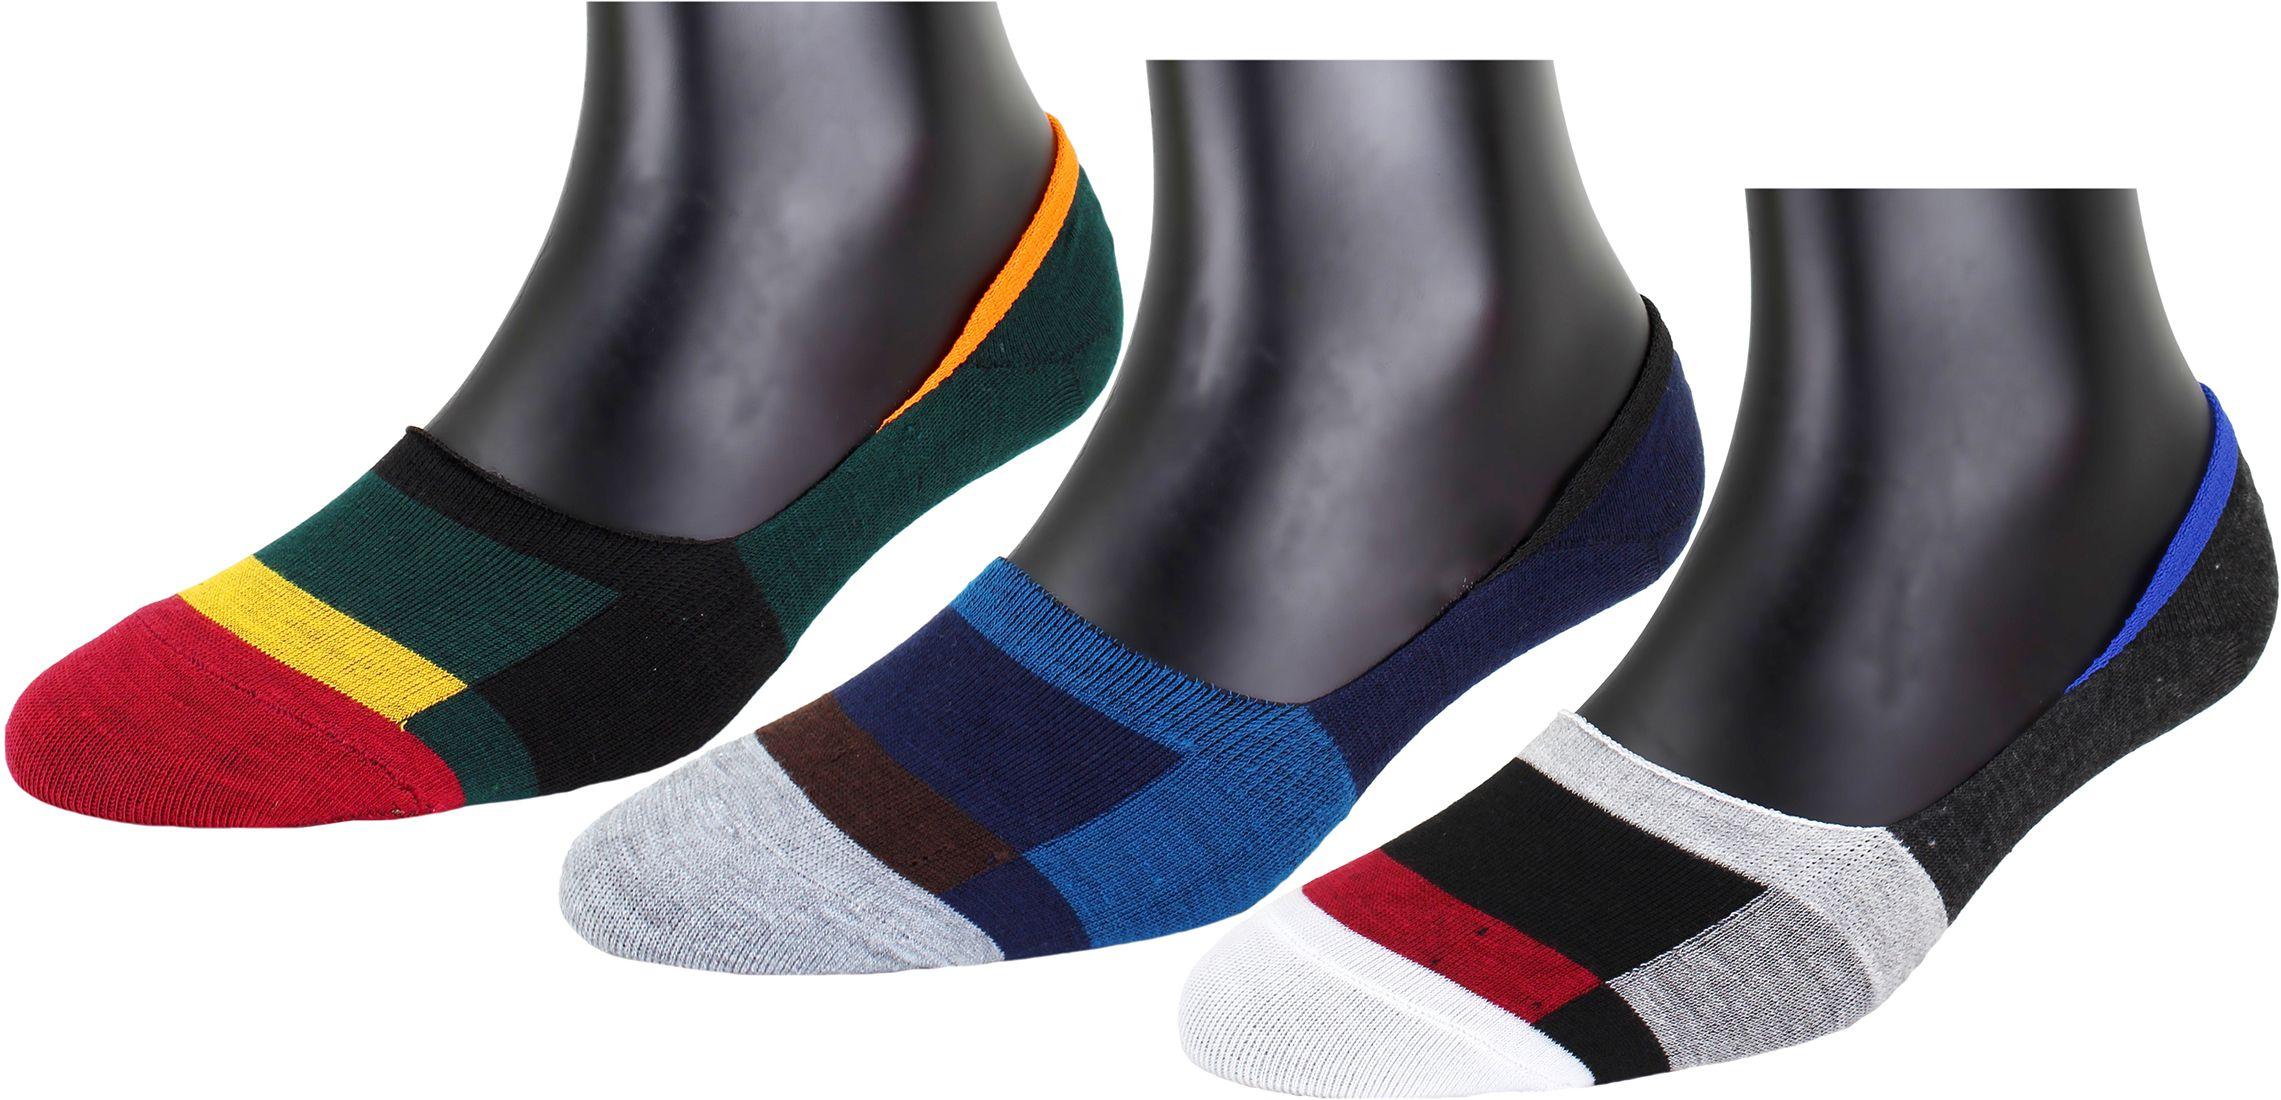 Neska Moda  Premium Men & Women 3 Pairs Green and Dark Blue Cotton No Show Loafer Socks With Silicon Gel-S972